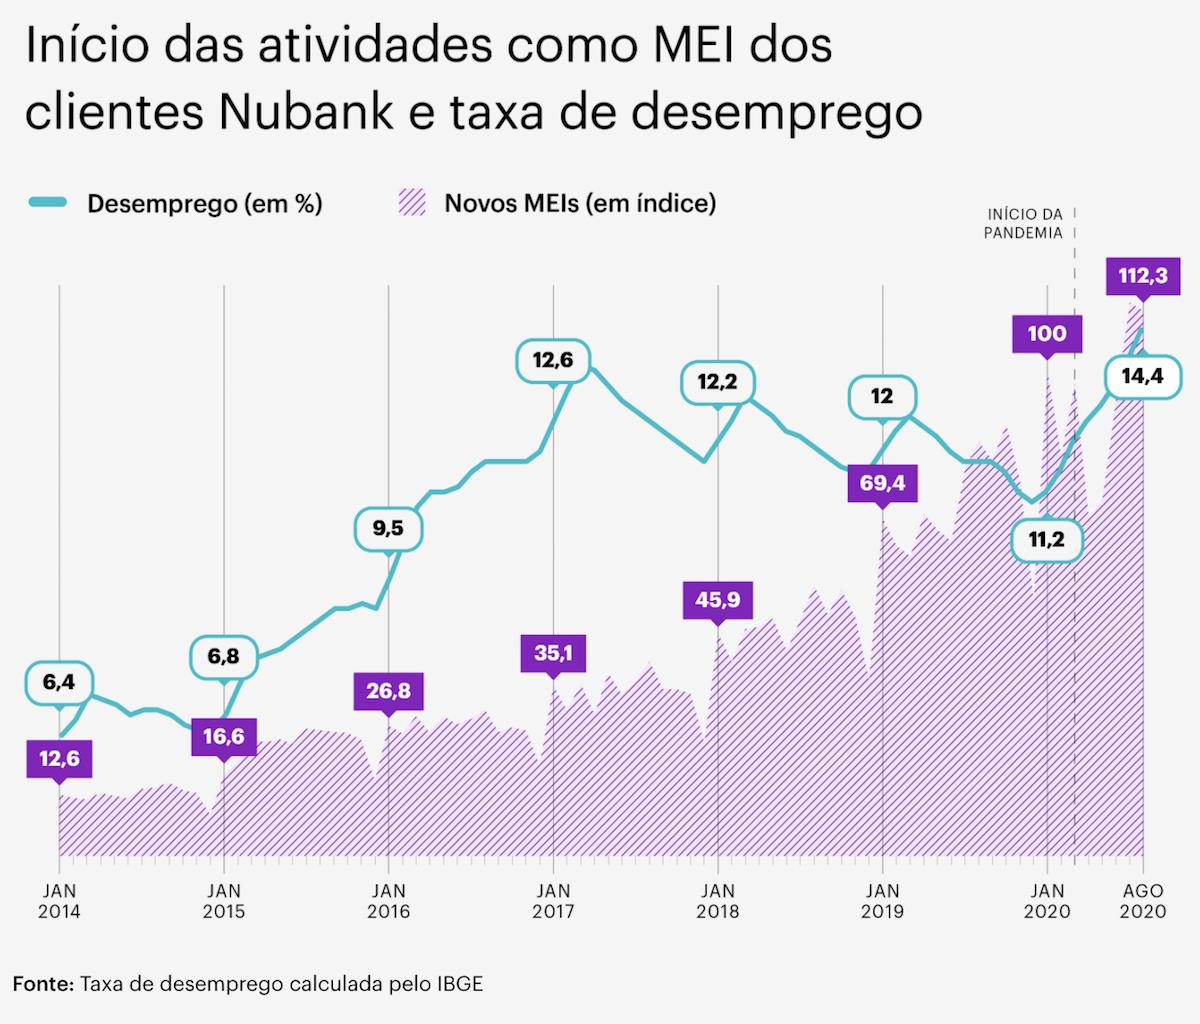 Data Nubank MEI: gráfico mostra início das atividades como MEI dos clientes Nubank e taxa de desemprego